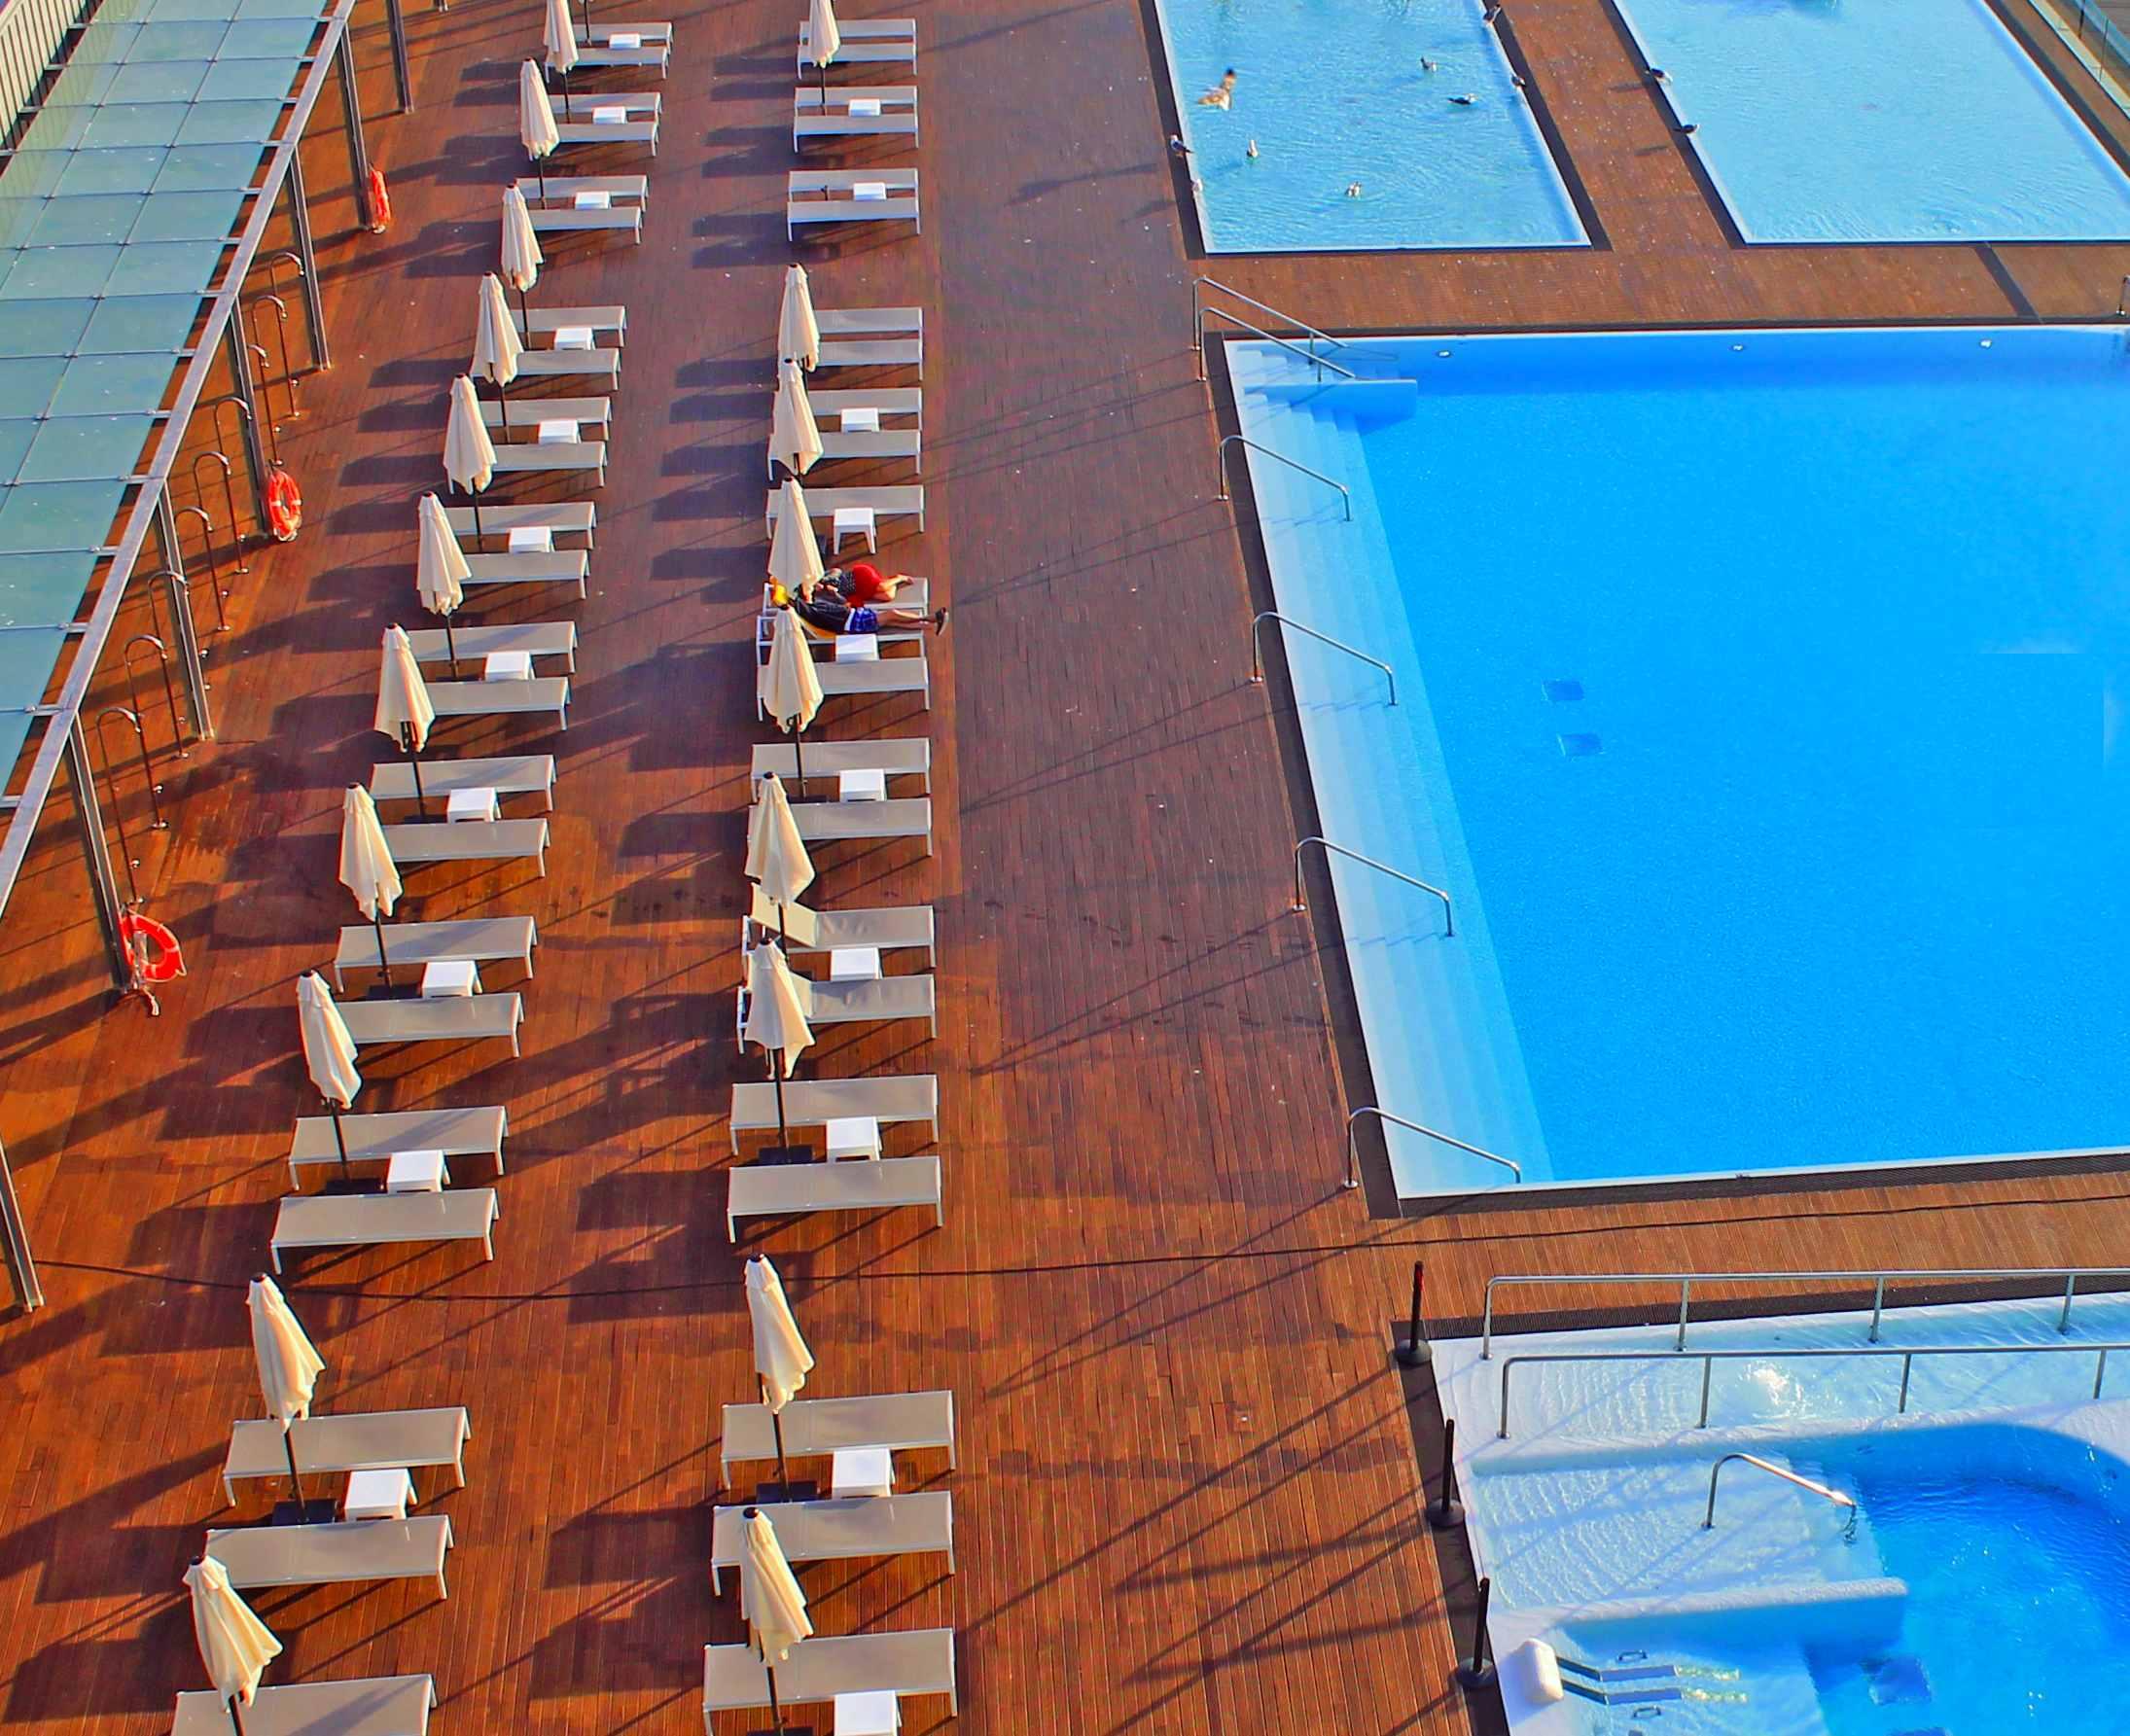 Hotel Atlantico - Focal journey